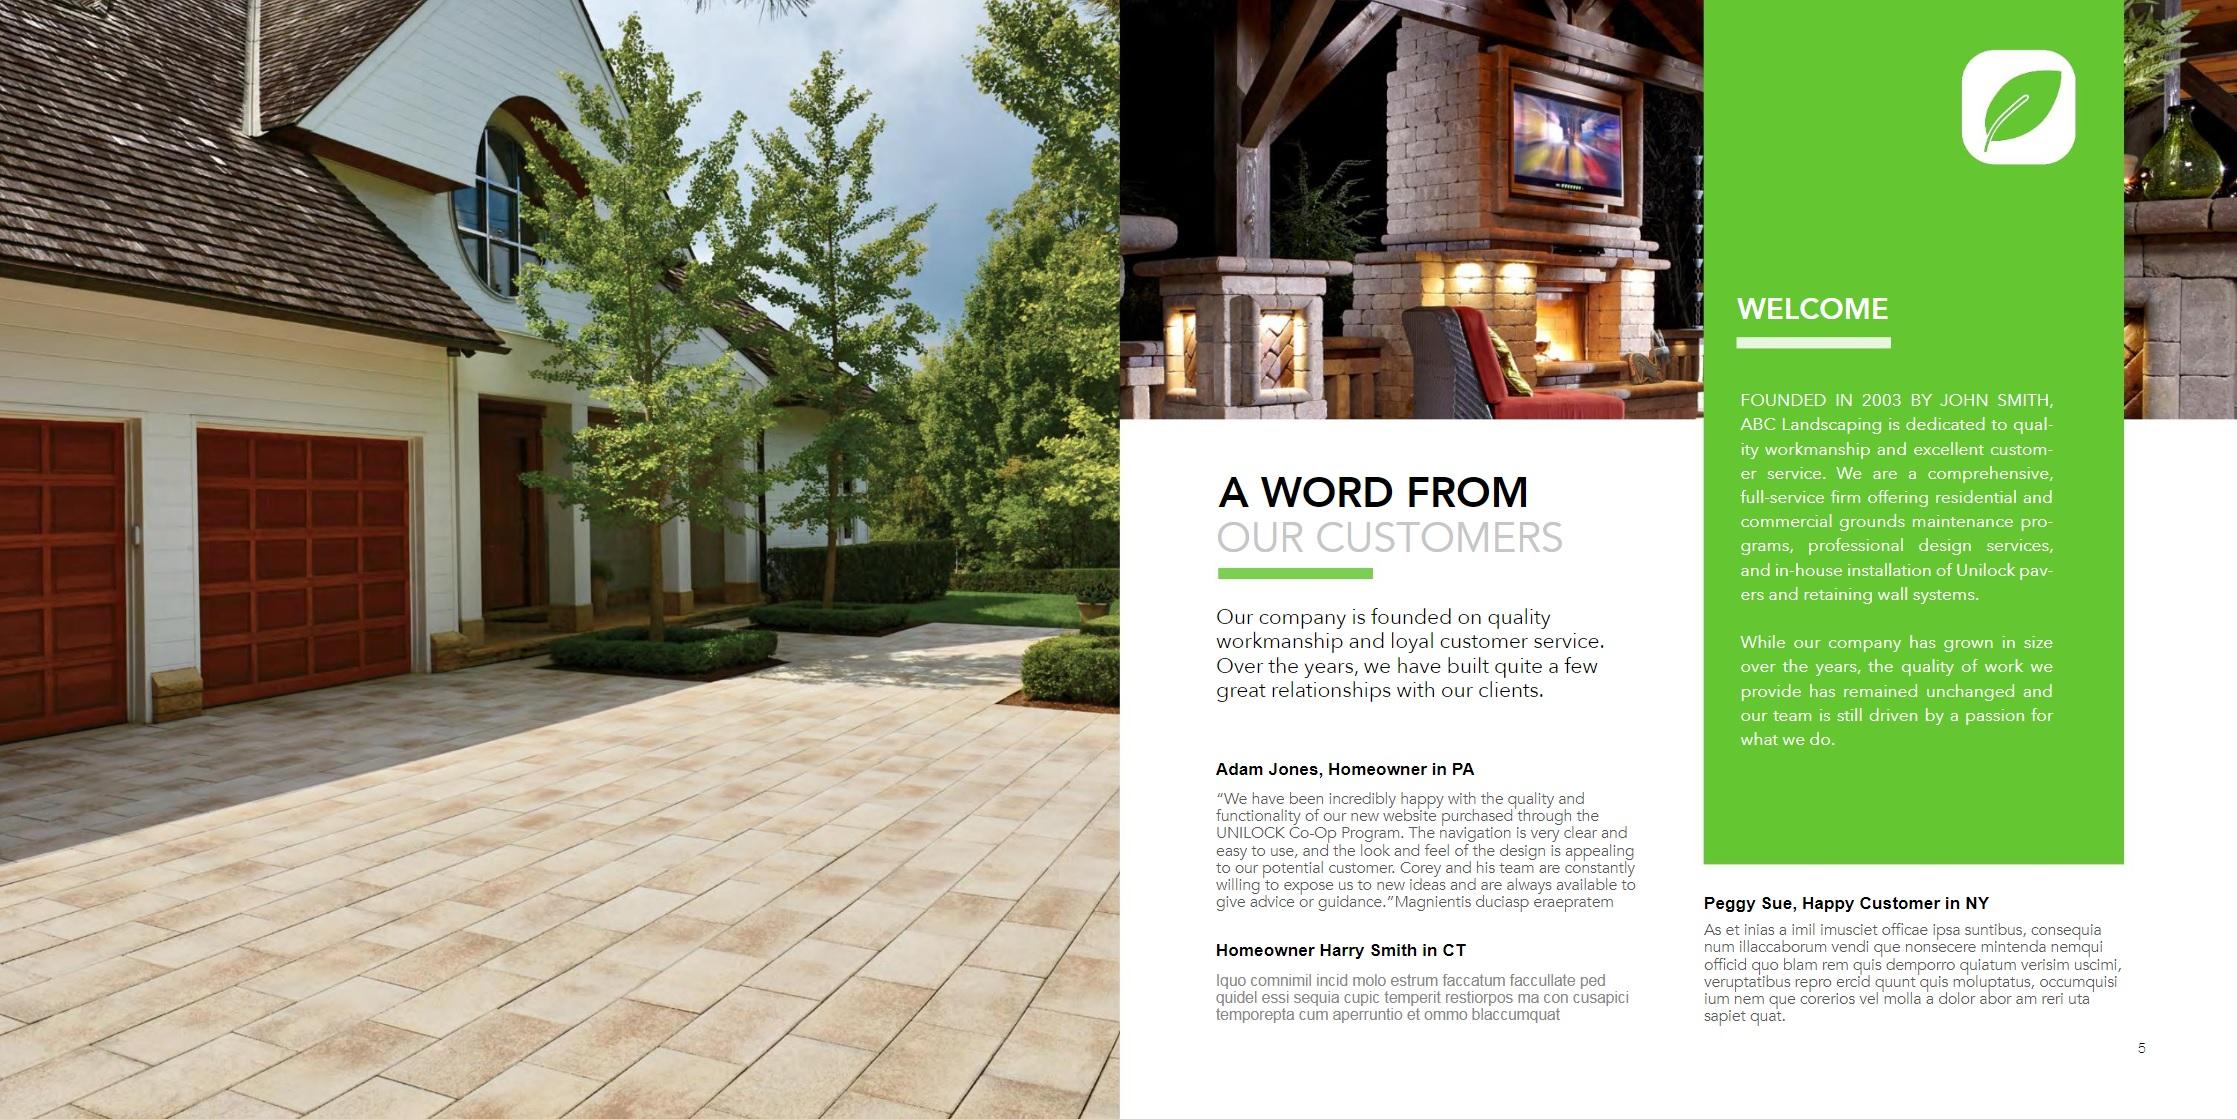 Square brochure - landscape marketing in Florida, including Jacksonville and Miami FL